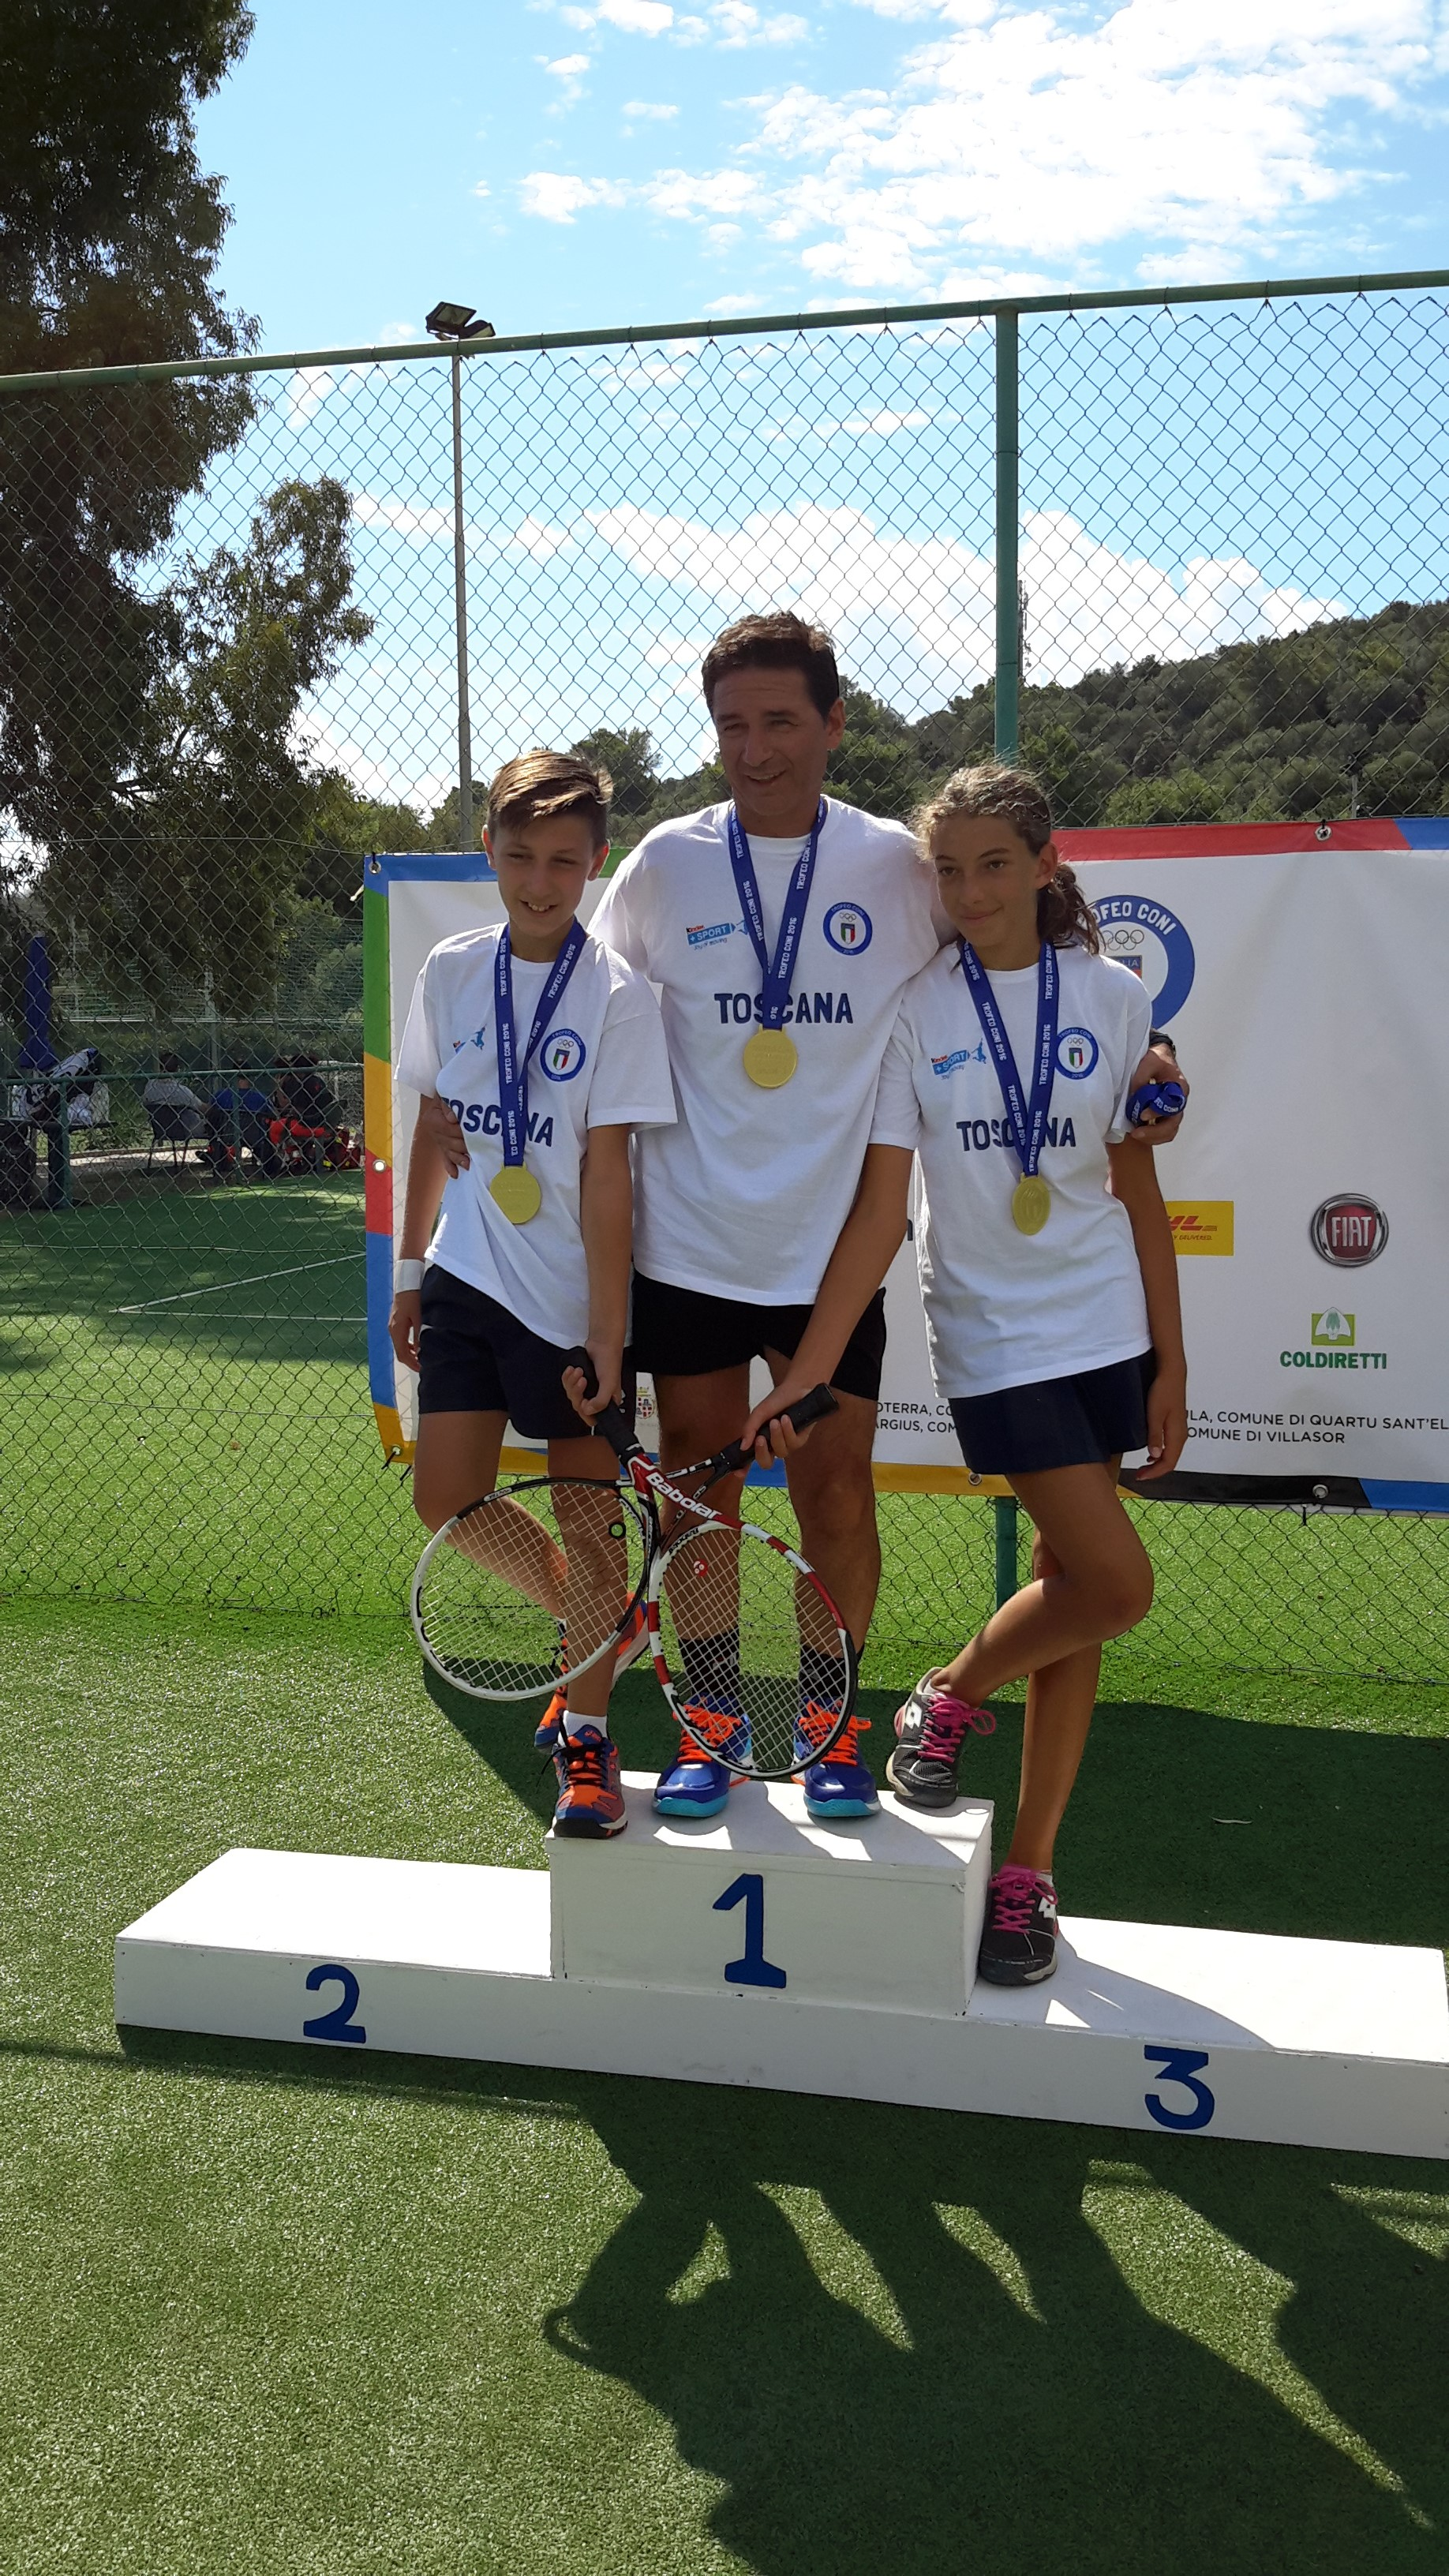 Tennis Club Mugello Galliano